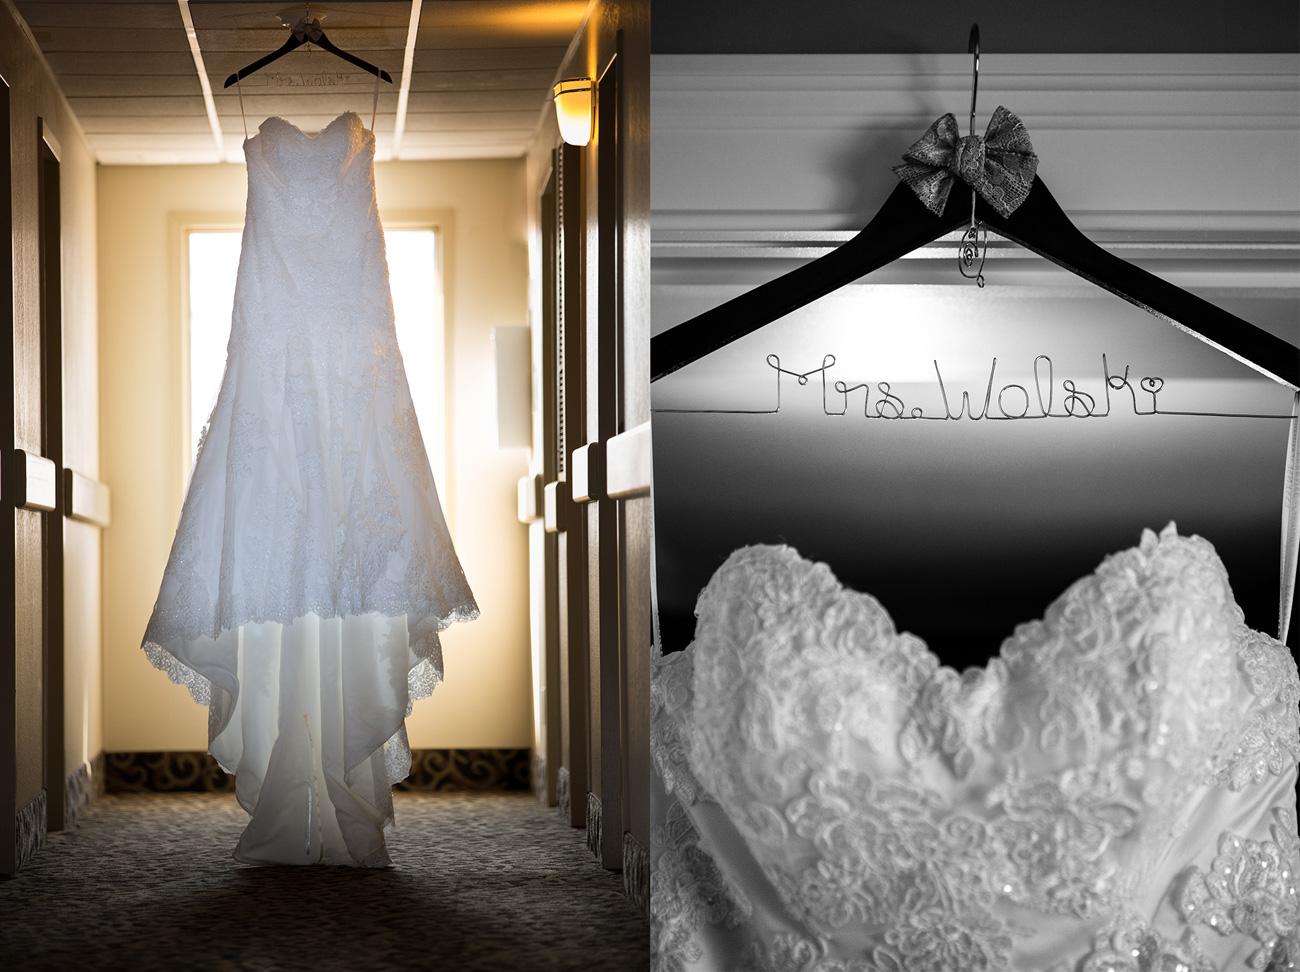 CJ & Jasen - Drumheller Wedding Photography - Calgary Wedding Photographer (4)